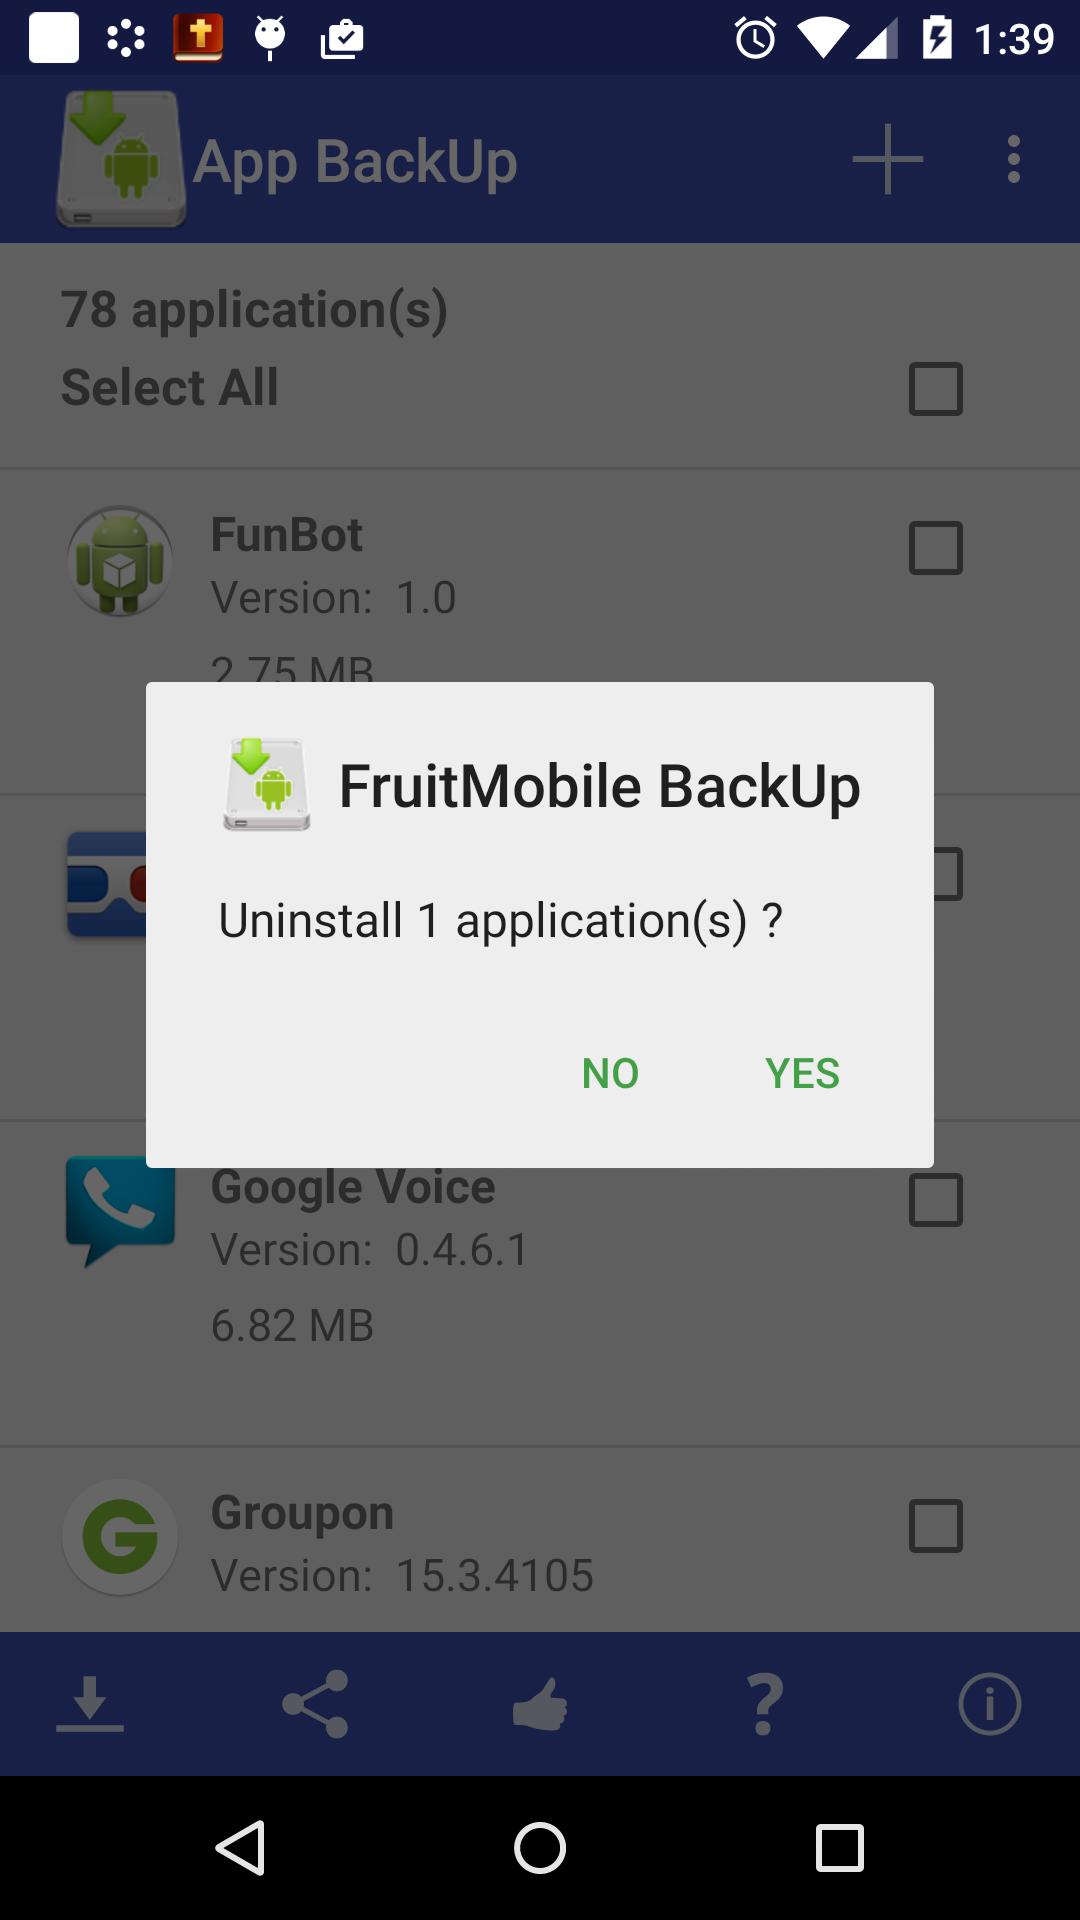 Amazon.com: App BackUp: Appstore para Android